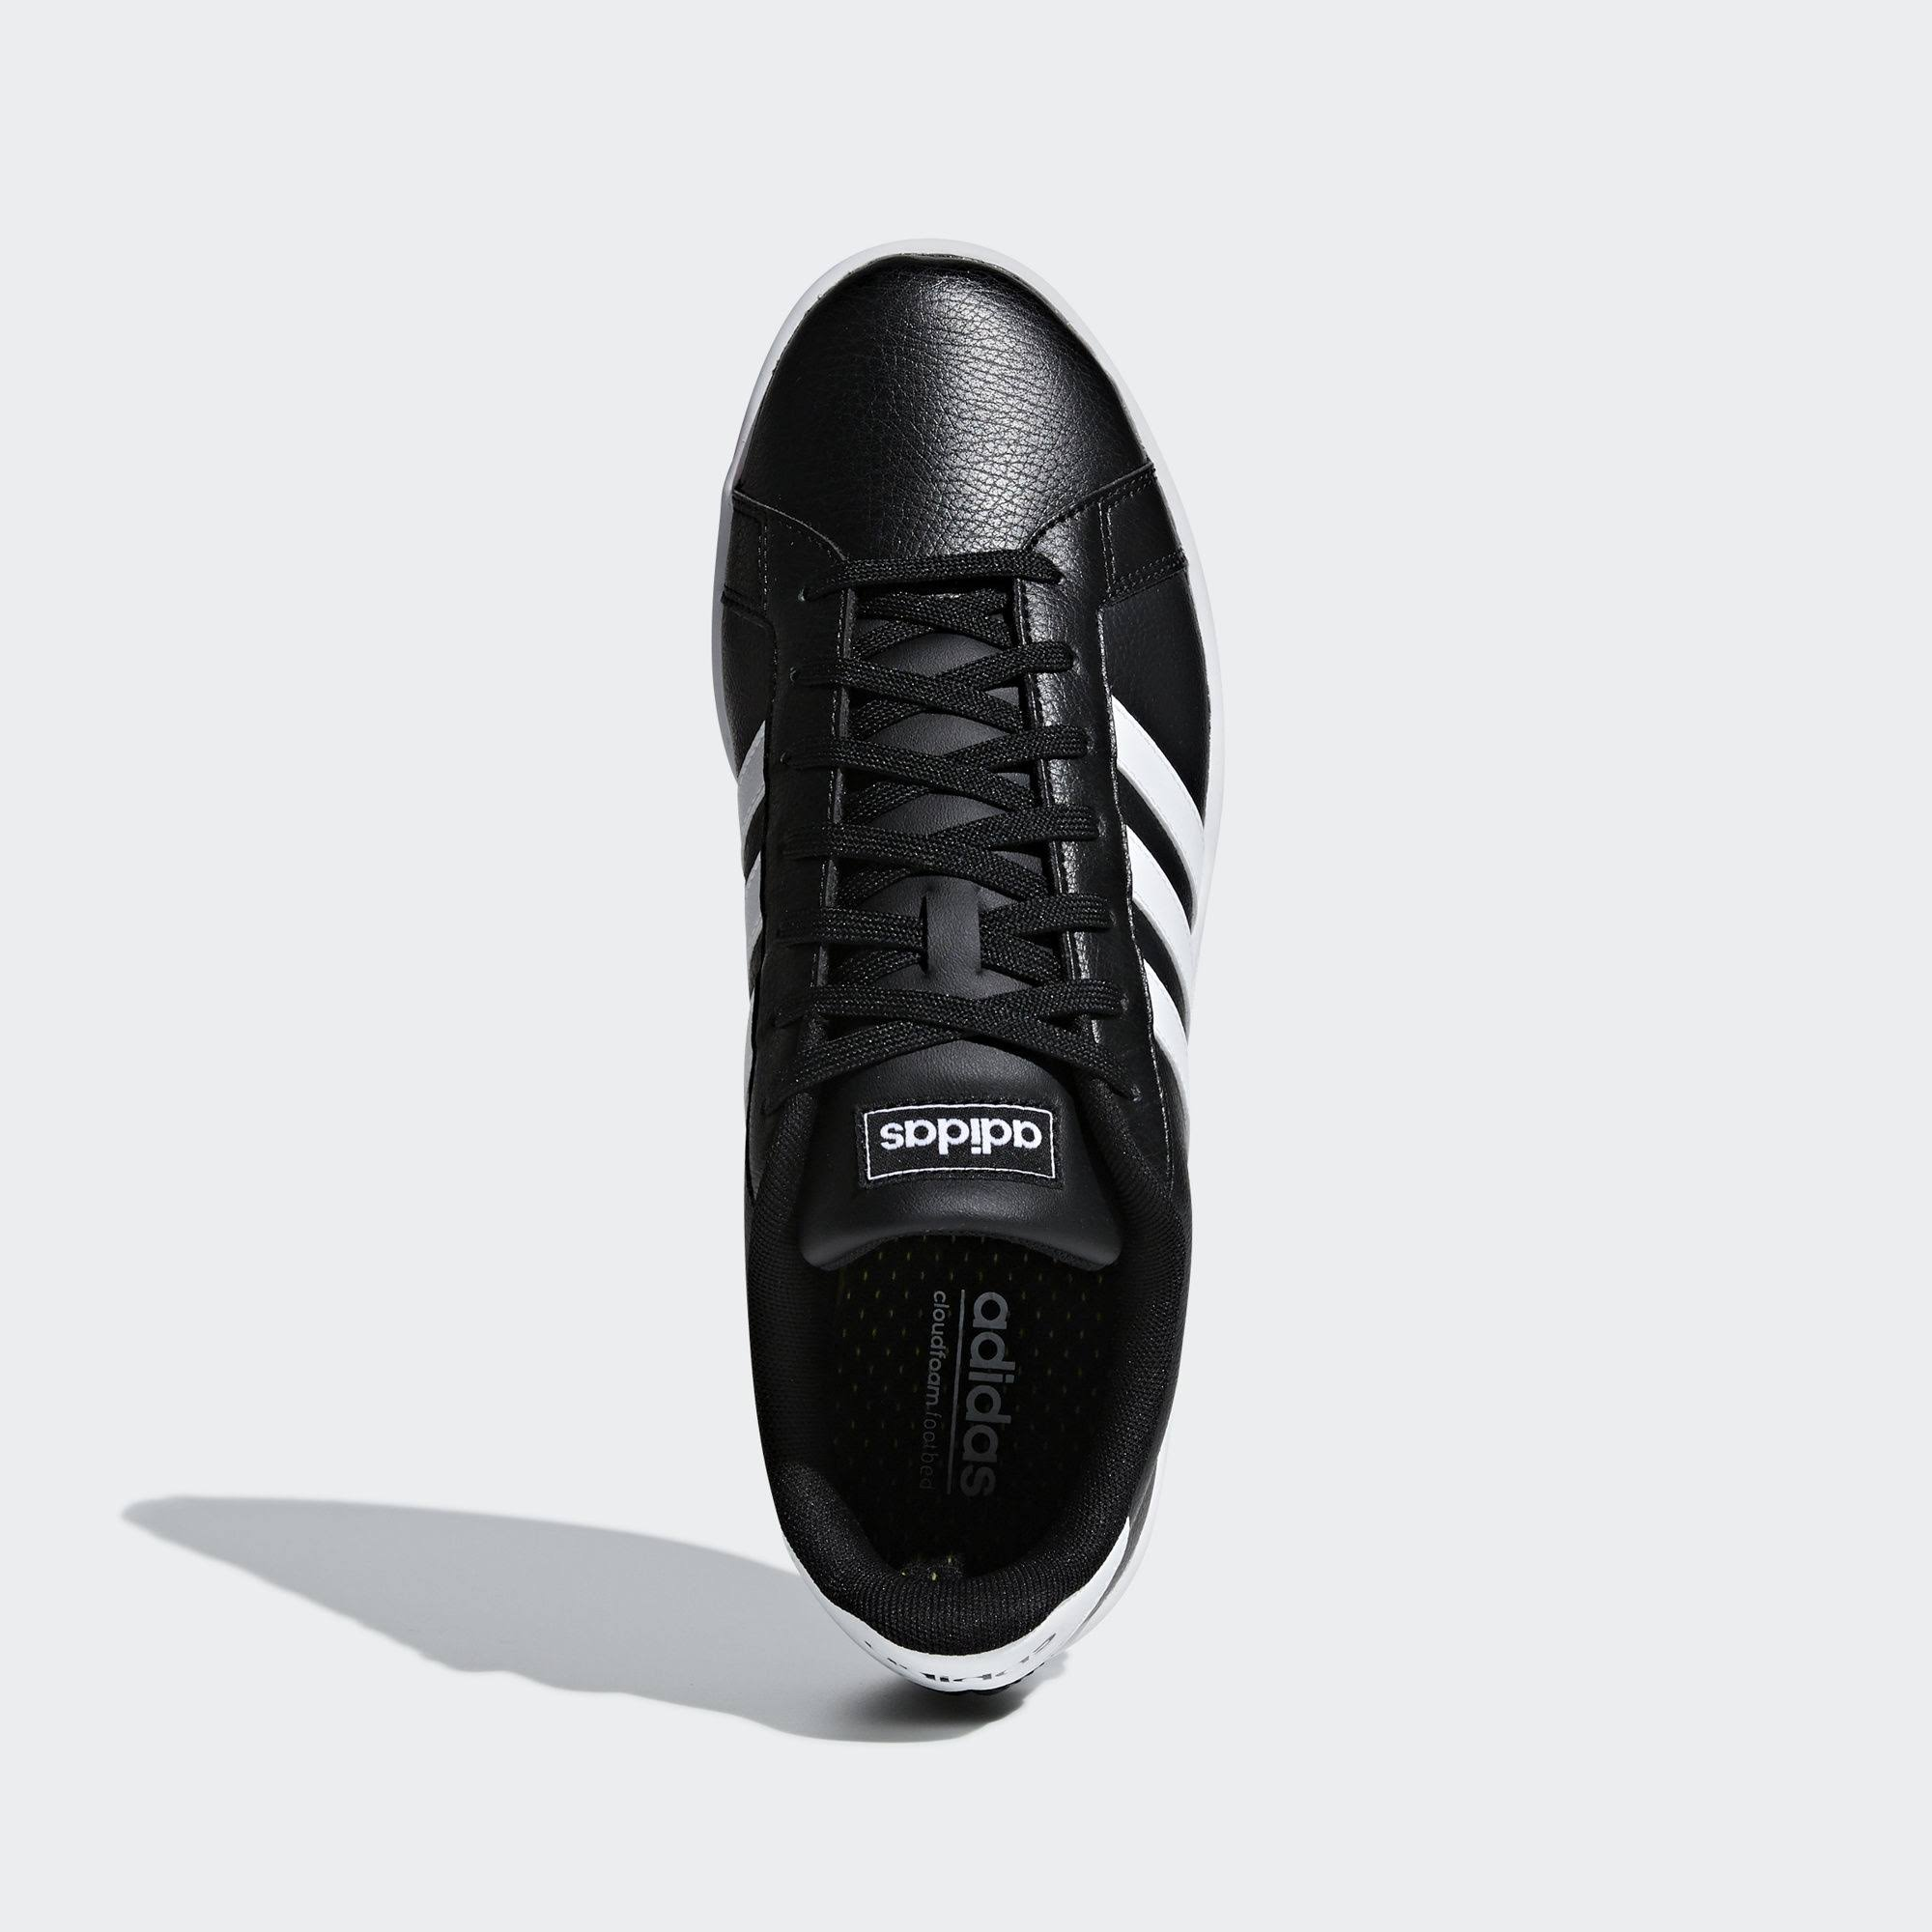 5nero Grand Sneaker Courtmisura11 Adidas uomo iOkwPXZTu